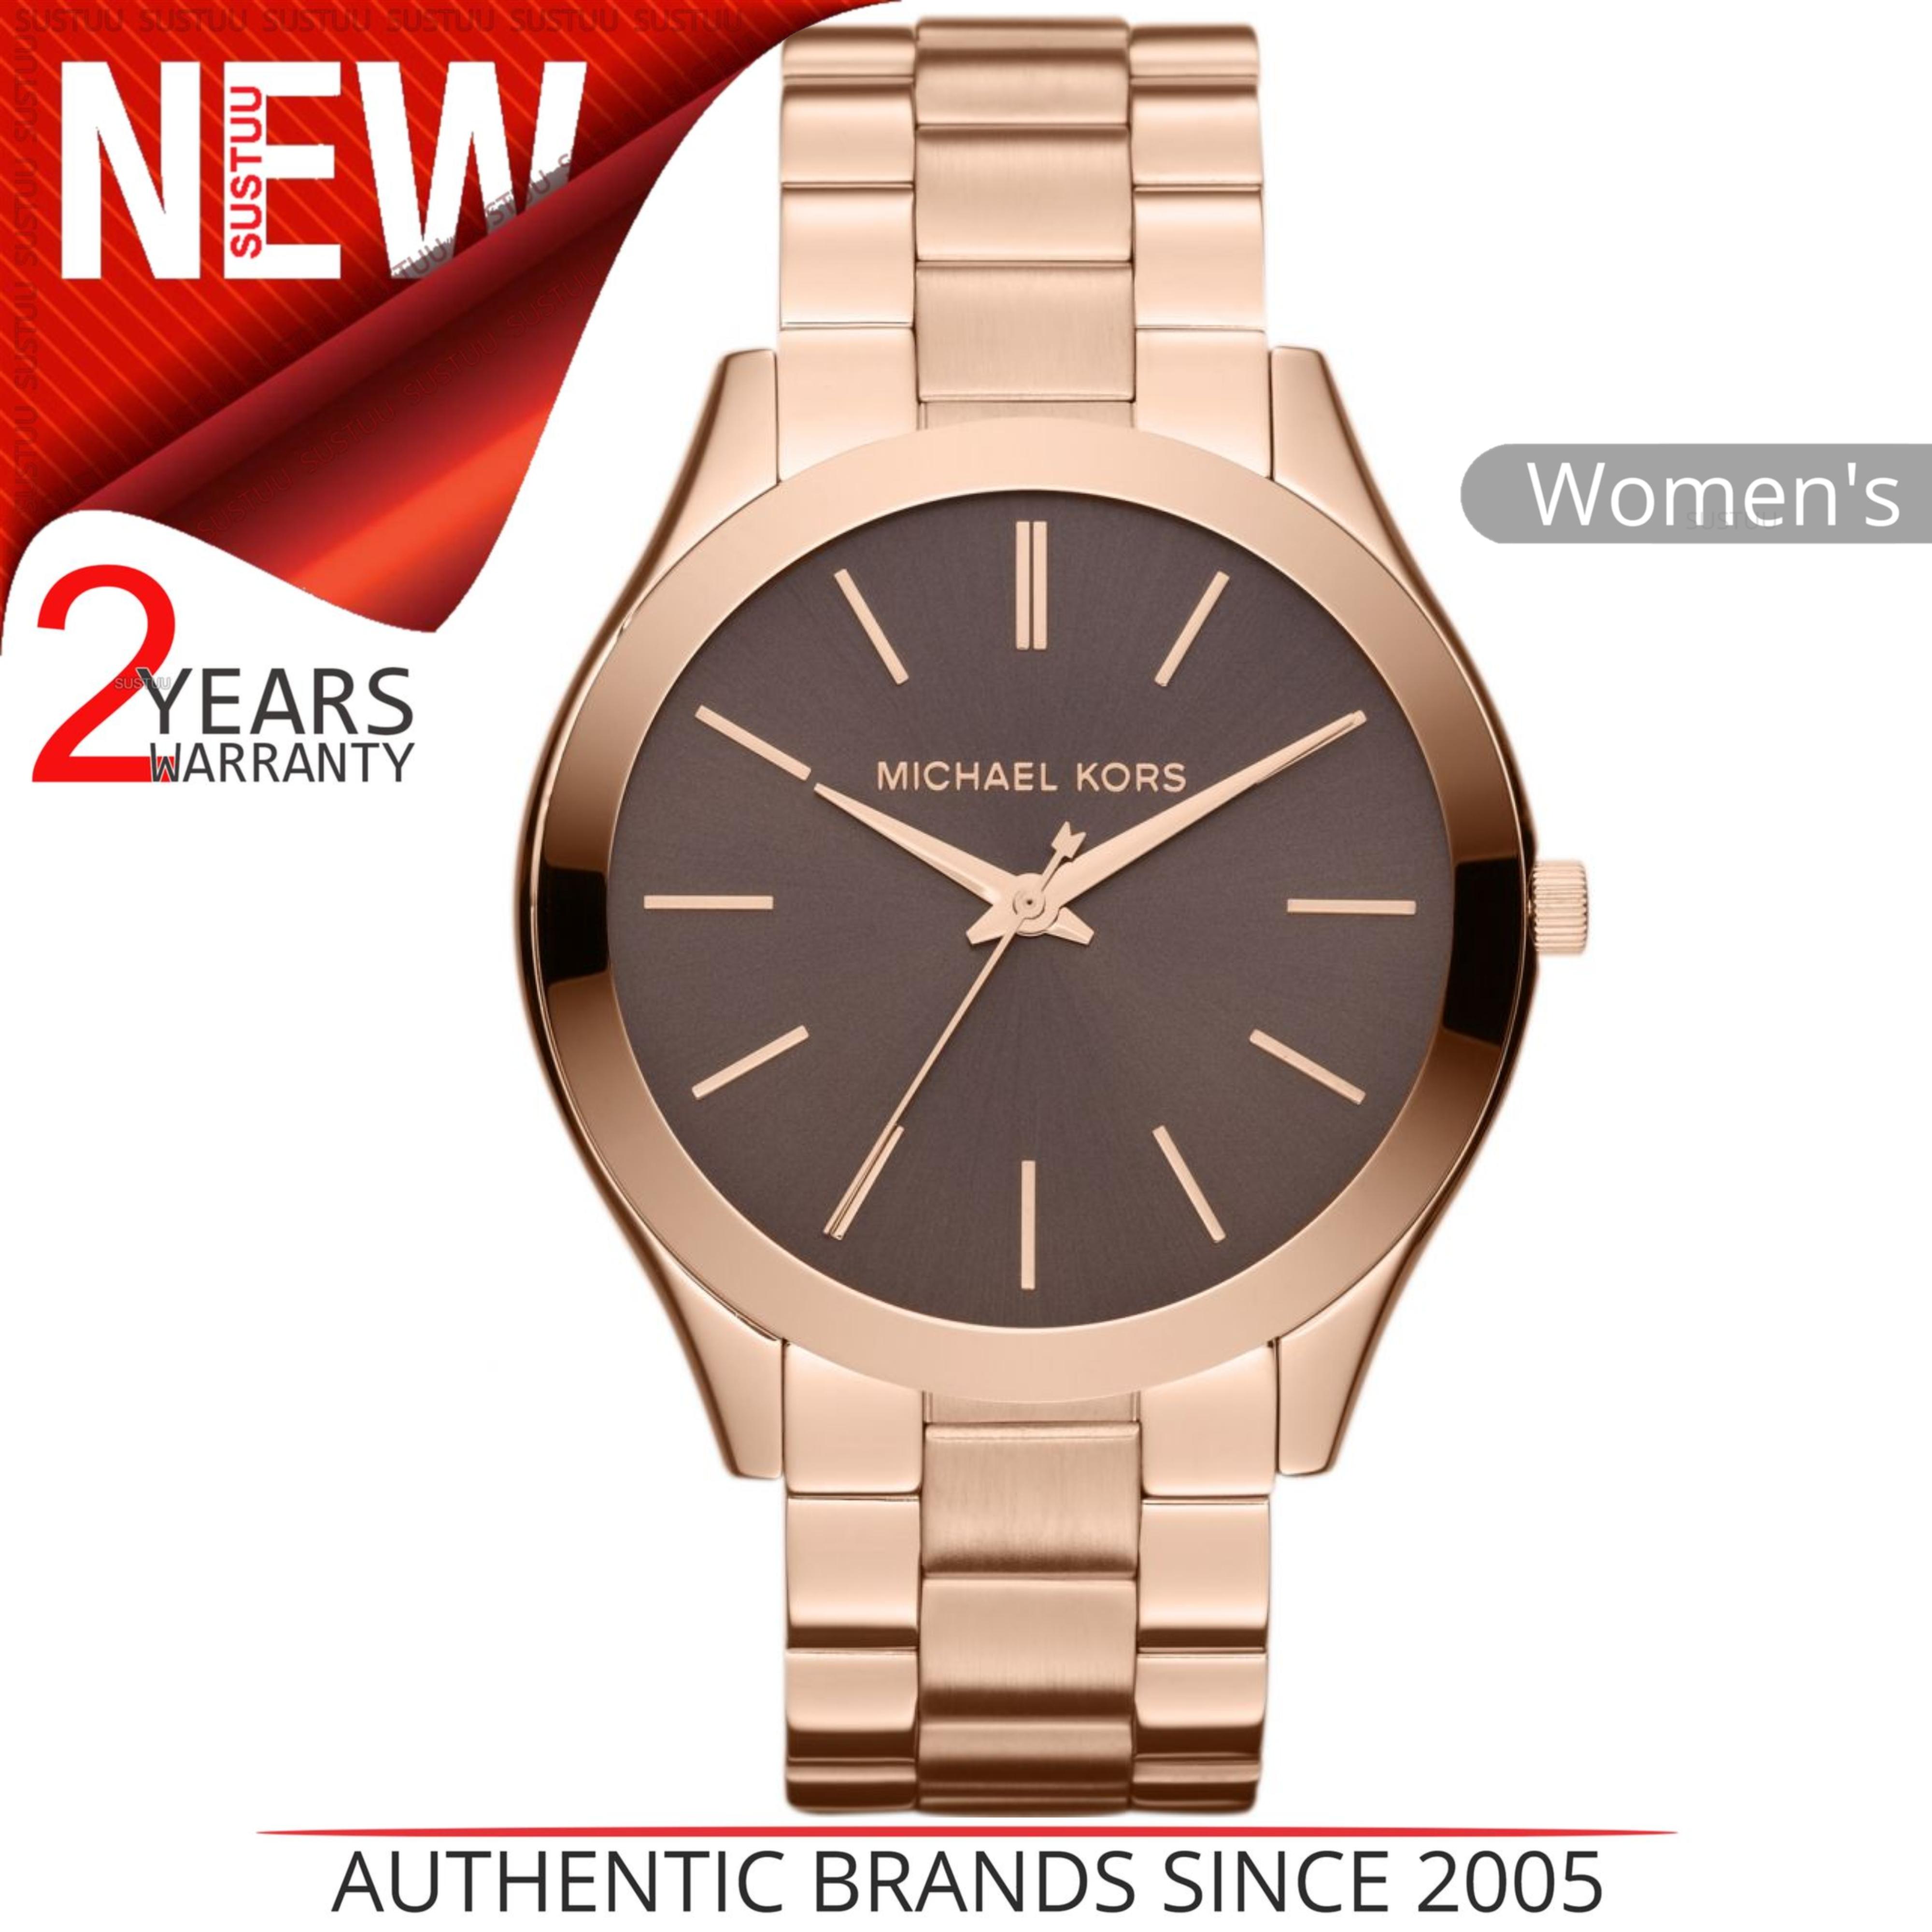 c2b494a0156b Details about Michael Kors Runway Ladies Watch MK3181│Rose Gold Tone  Stainless Steel Bracelet